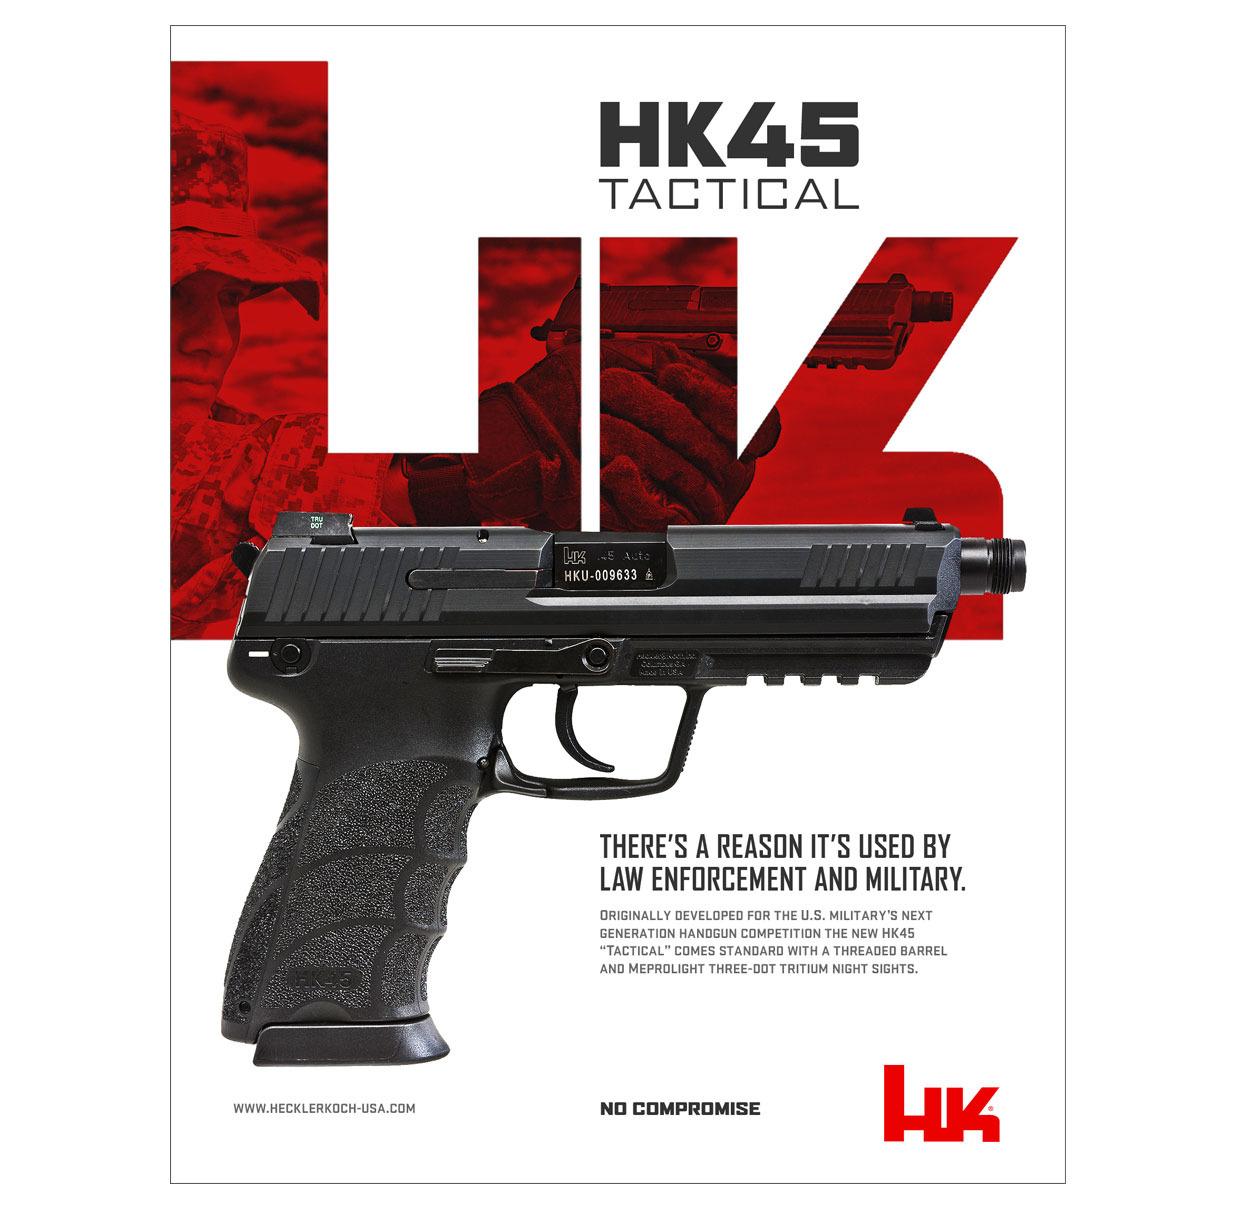 Heckler & Koch HK45 Tactical Ad - Visual Foundry